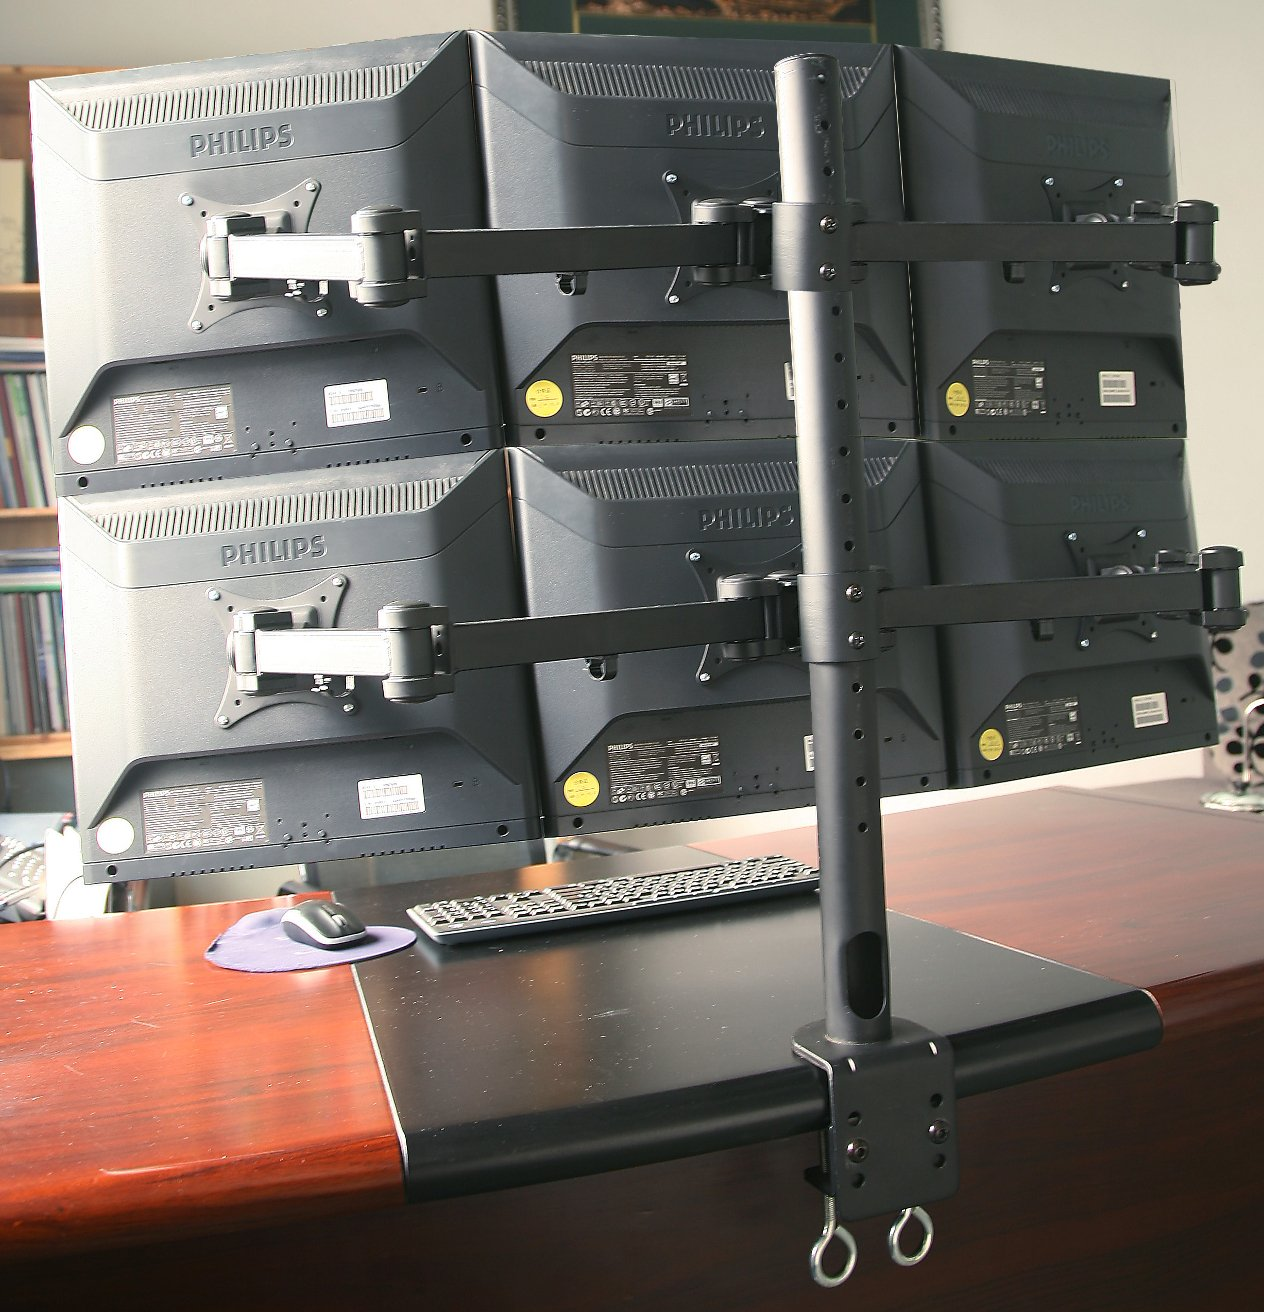 Amazon com vivo triple lcd monitor desk mount stand heavy duty fully - Amazon Com Vivo Hex Lcd Monitor Desk Mount Stand Heavy Duty Fully Adjustable 6 Screens Upto 24 Stand V006 Computers Accessories